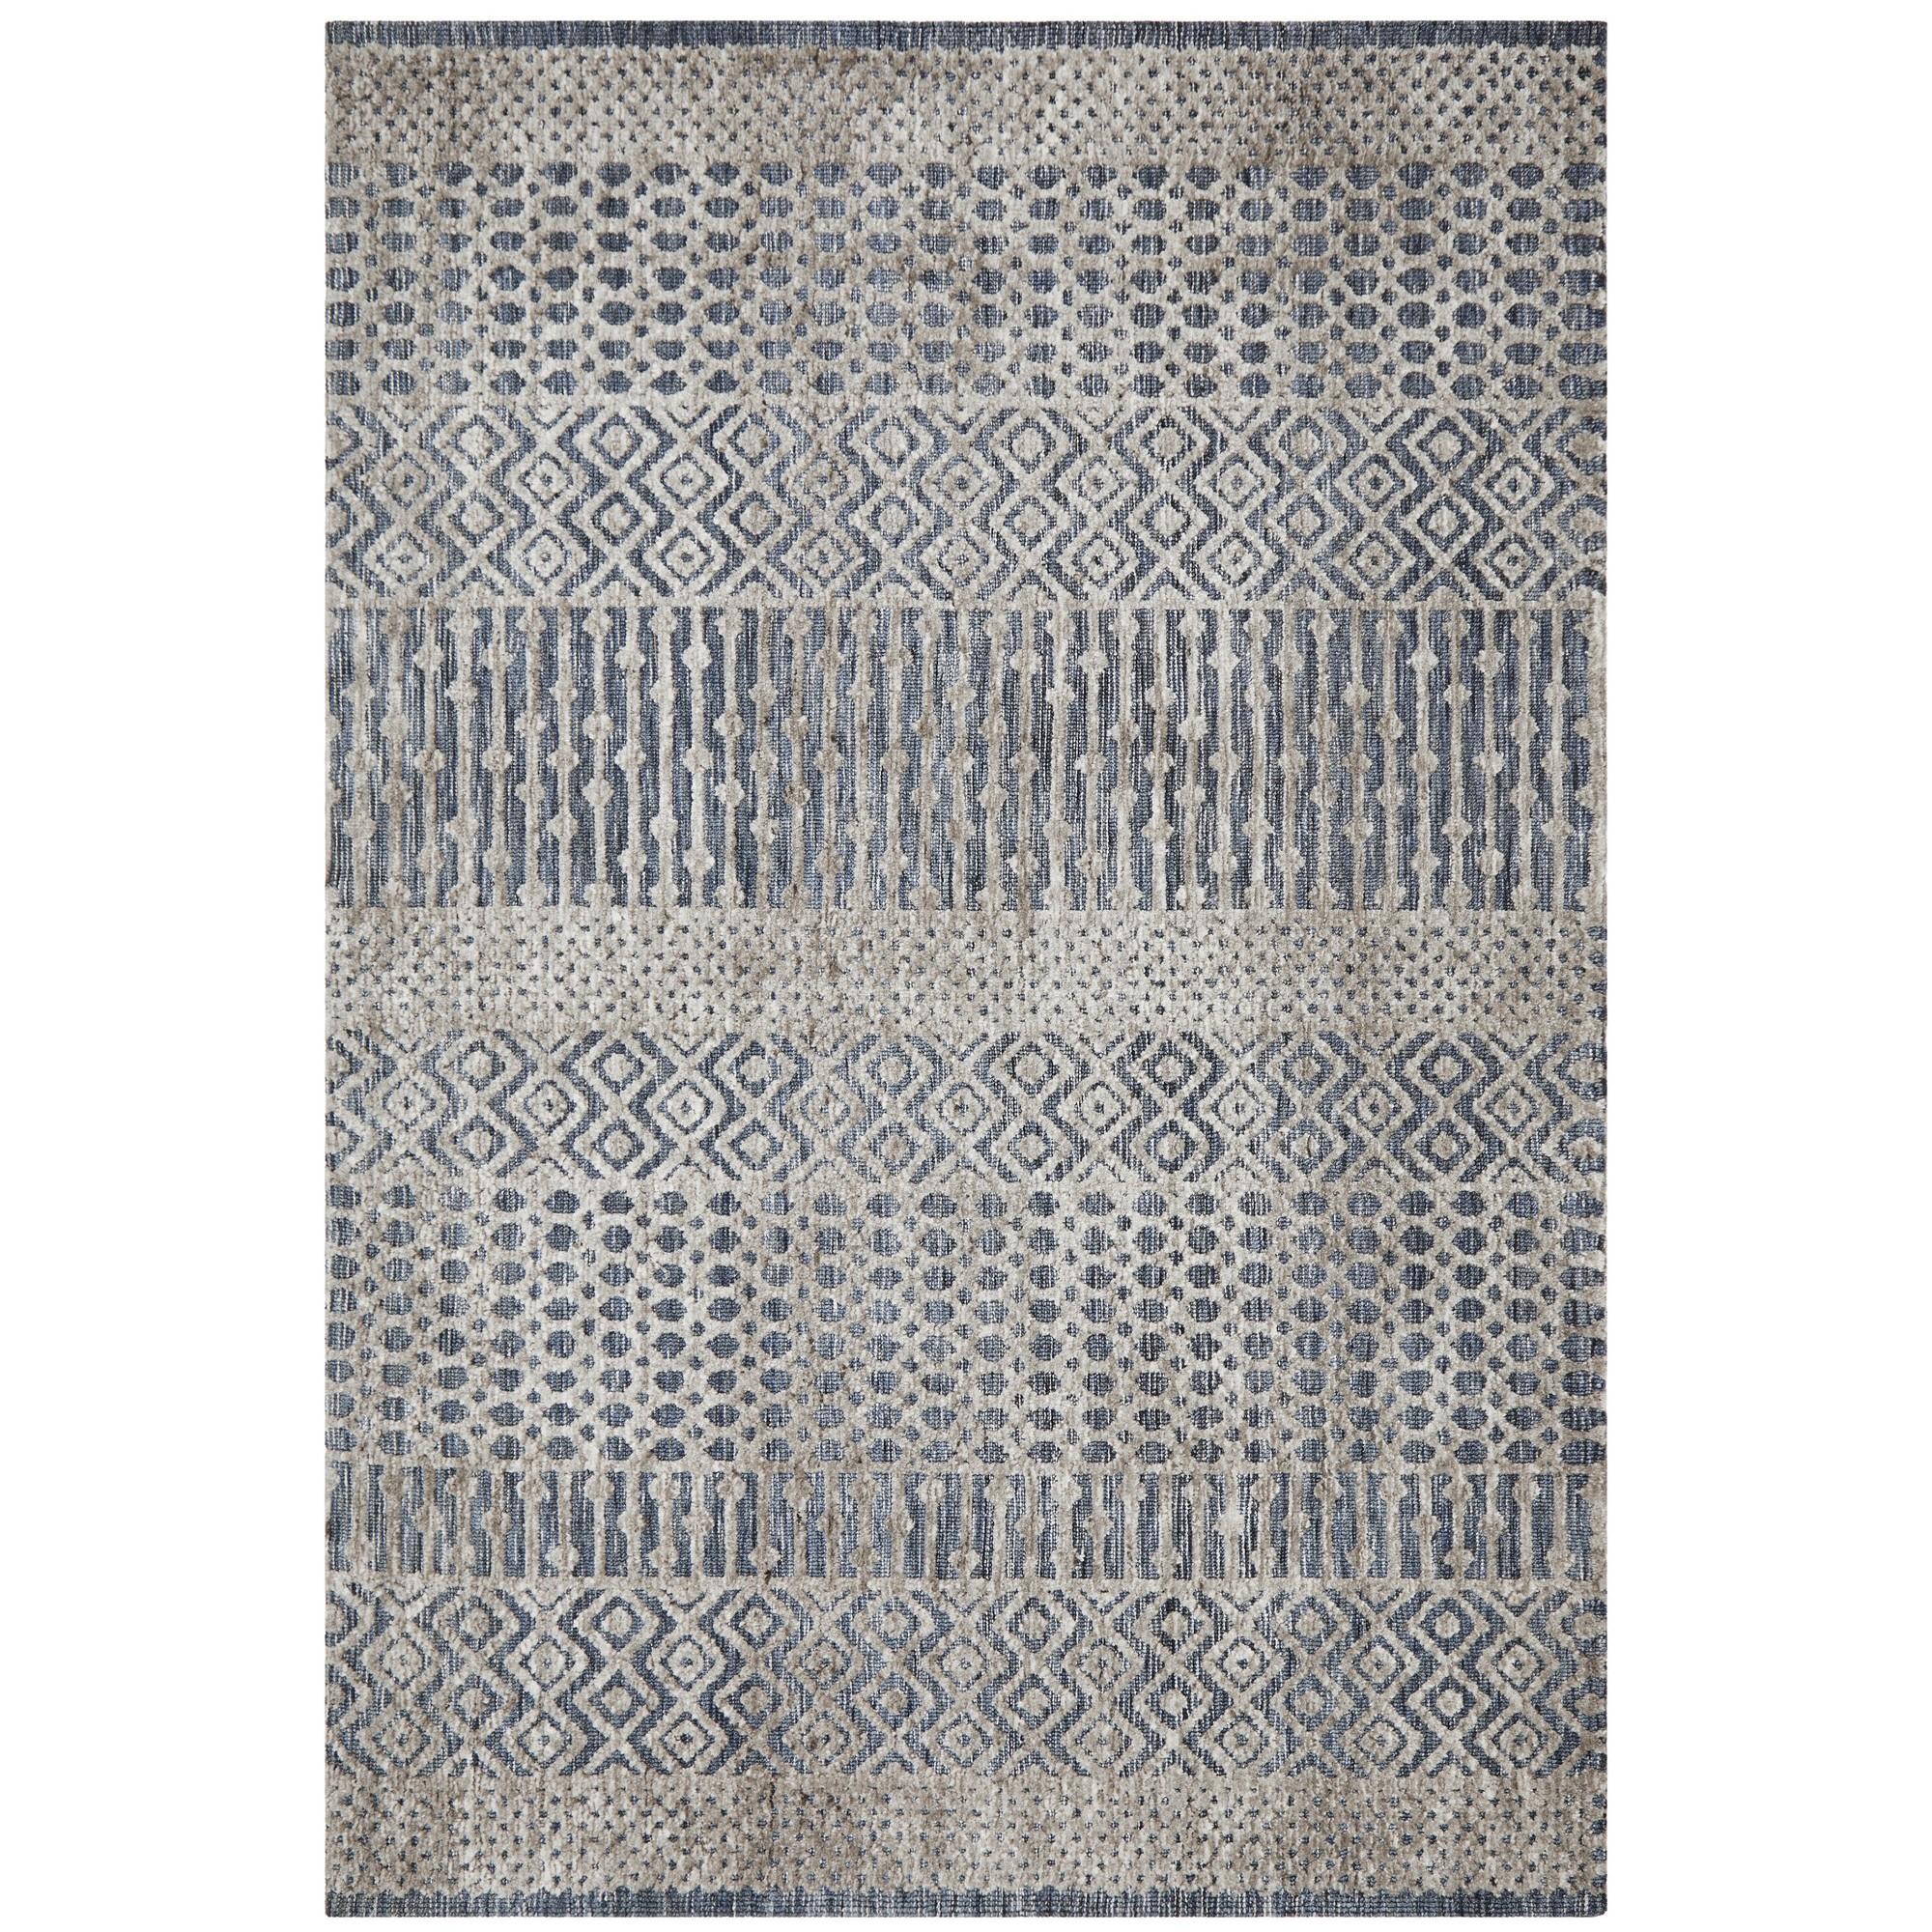 Levi Linden Tribal Rug, 400x300cm, Navy / Grey